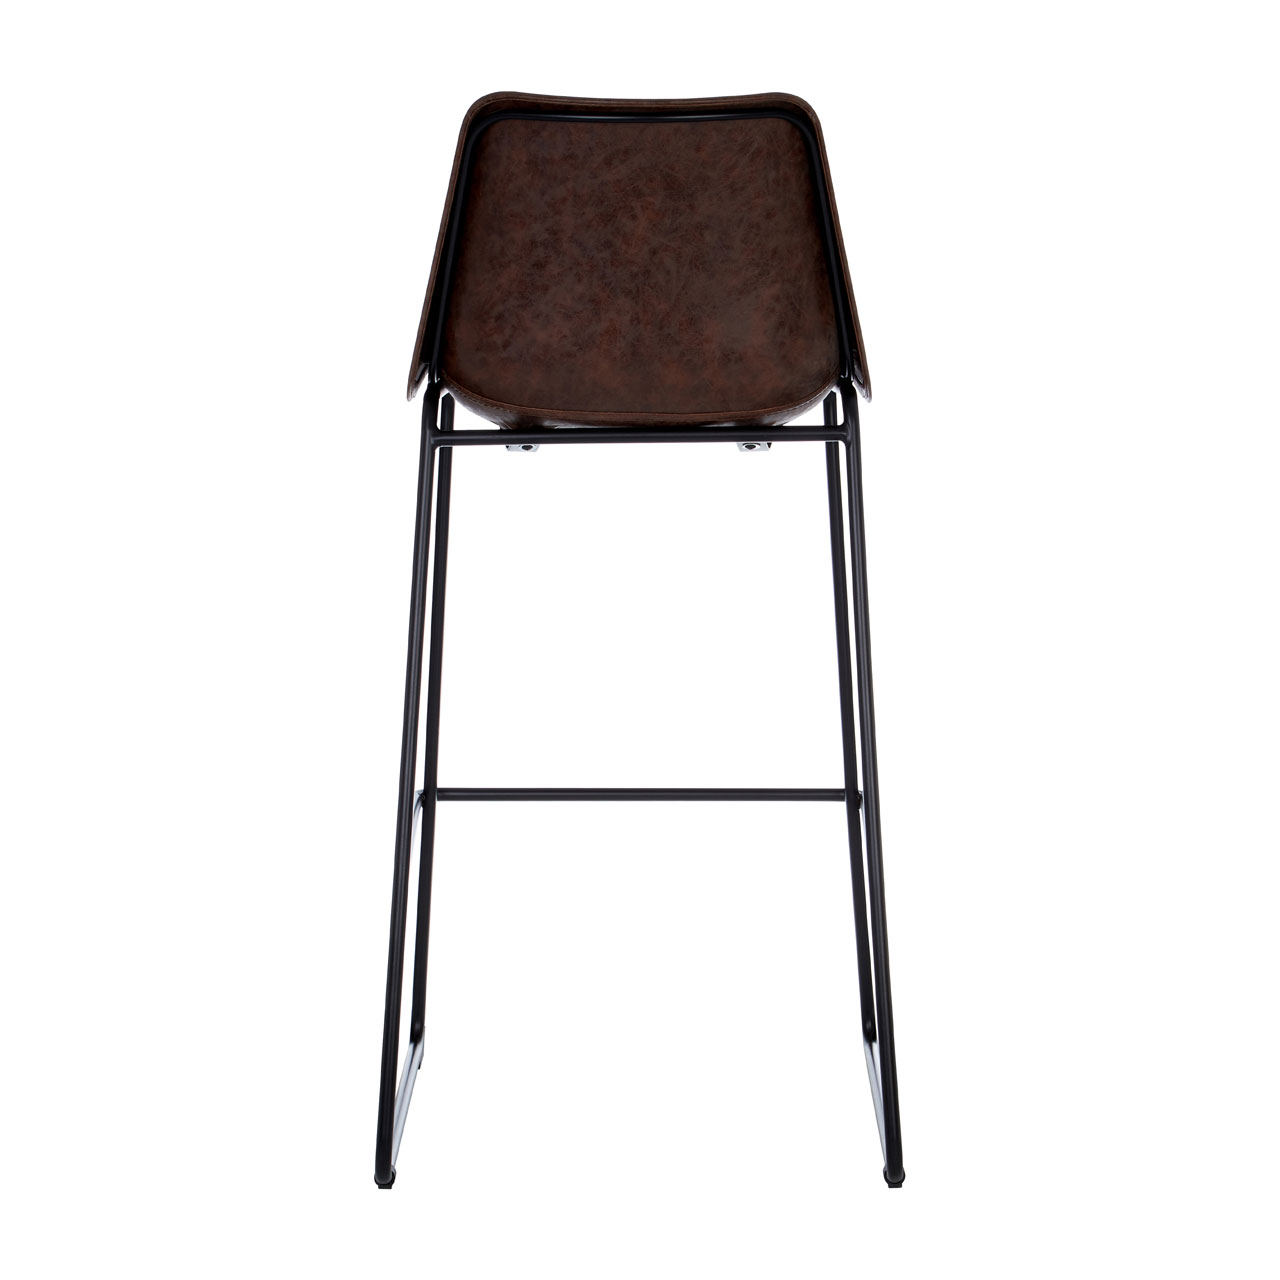 Dalston Bar Stool Vintage Mocha Faux Leather Seat